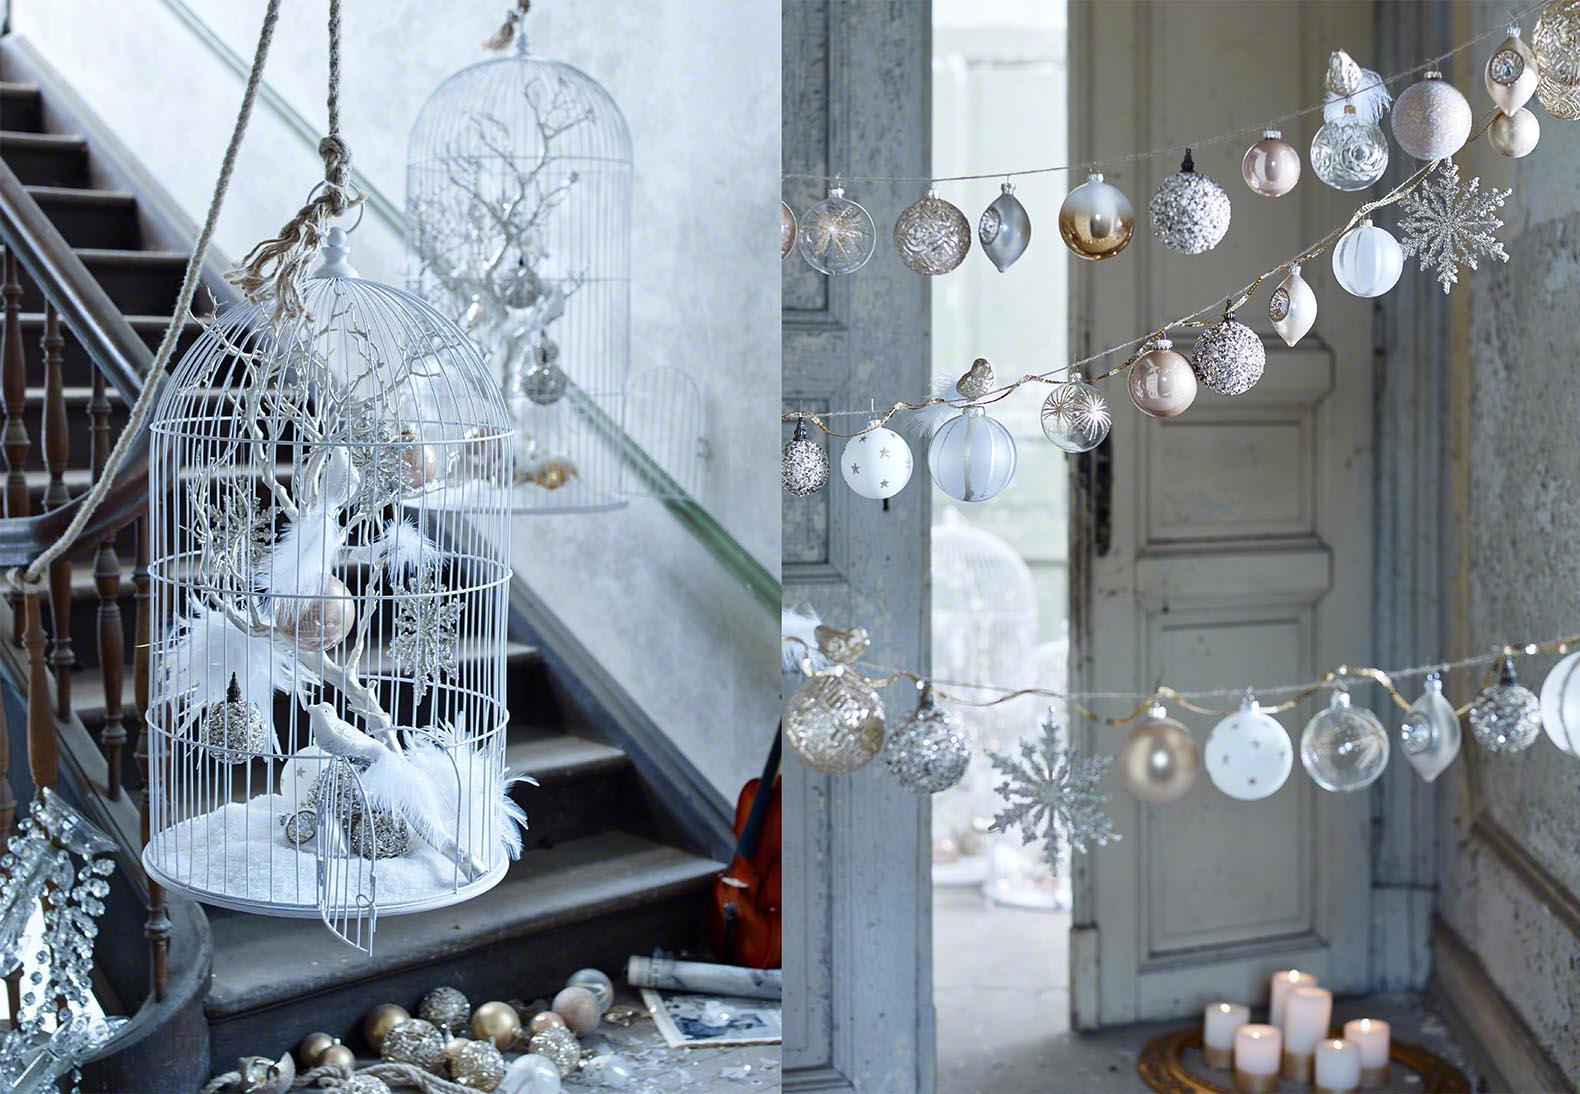 depot weihnachten articus r ttgen fotografie. Black Bedroom Furniture Sets. Home Design Ideas